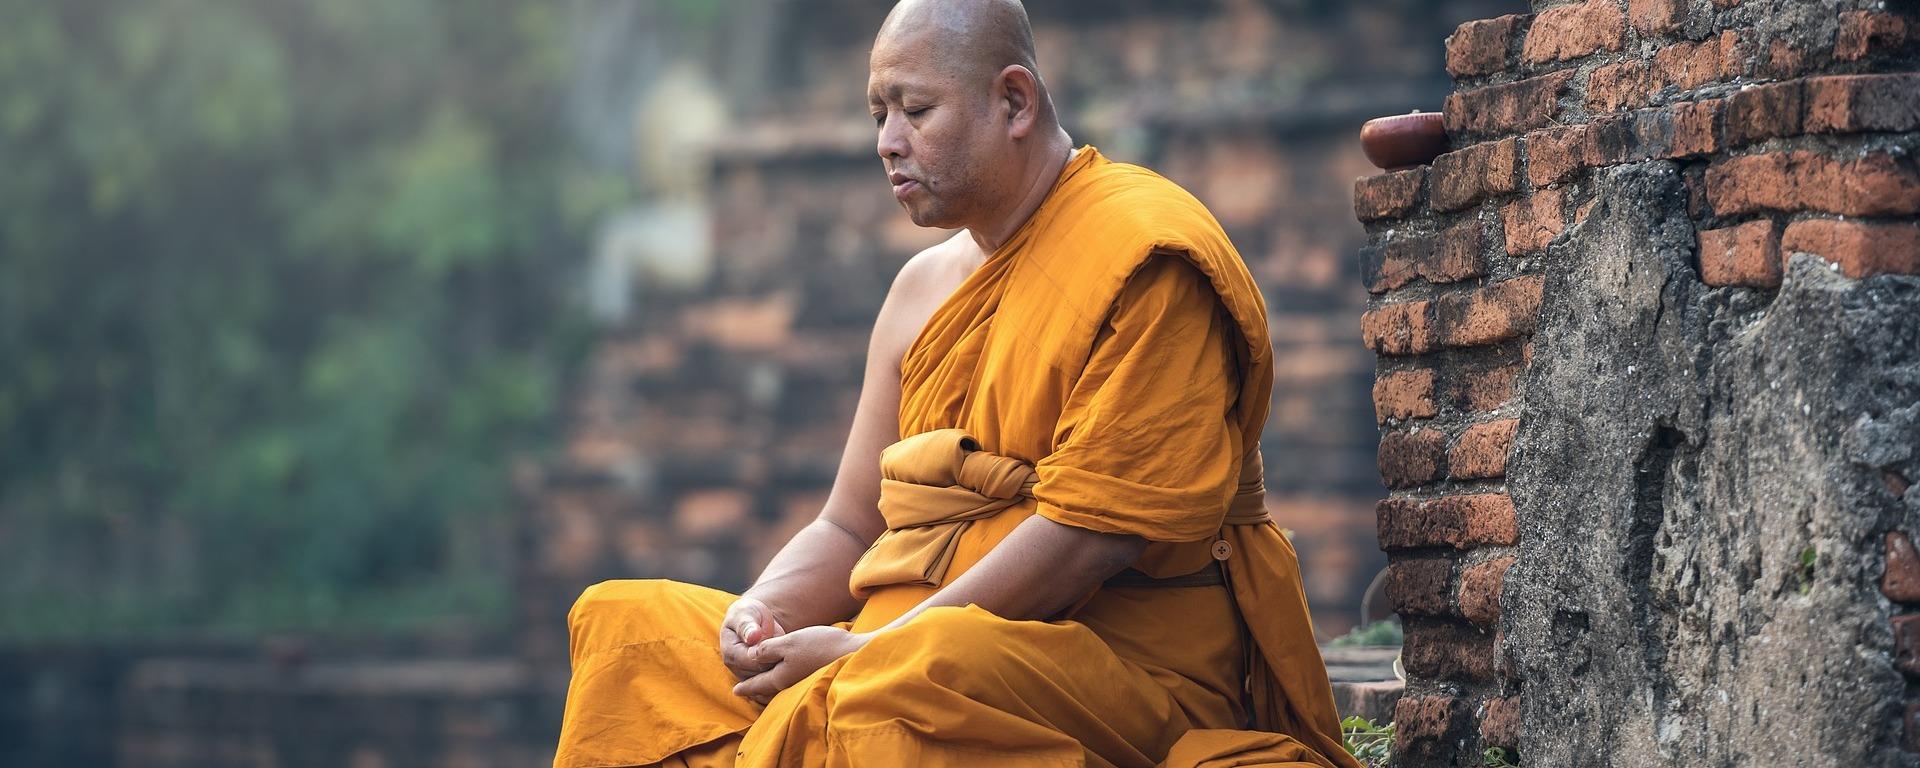 buddhist,monk,sitting,meditation,zen,meditate,meditative,ancient,asia,burma,faith,buddha,buddhism,contemplation,pensive,paying,DONCHARISMA